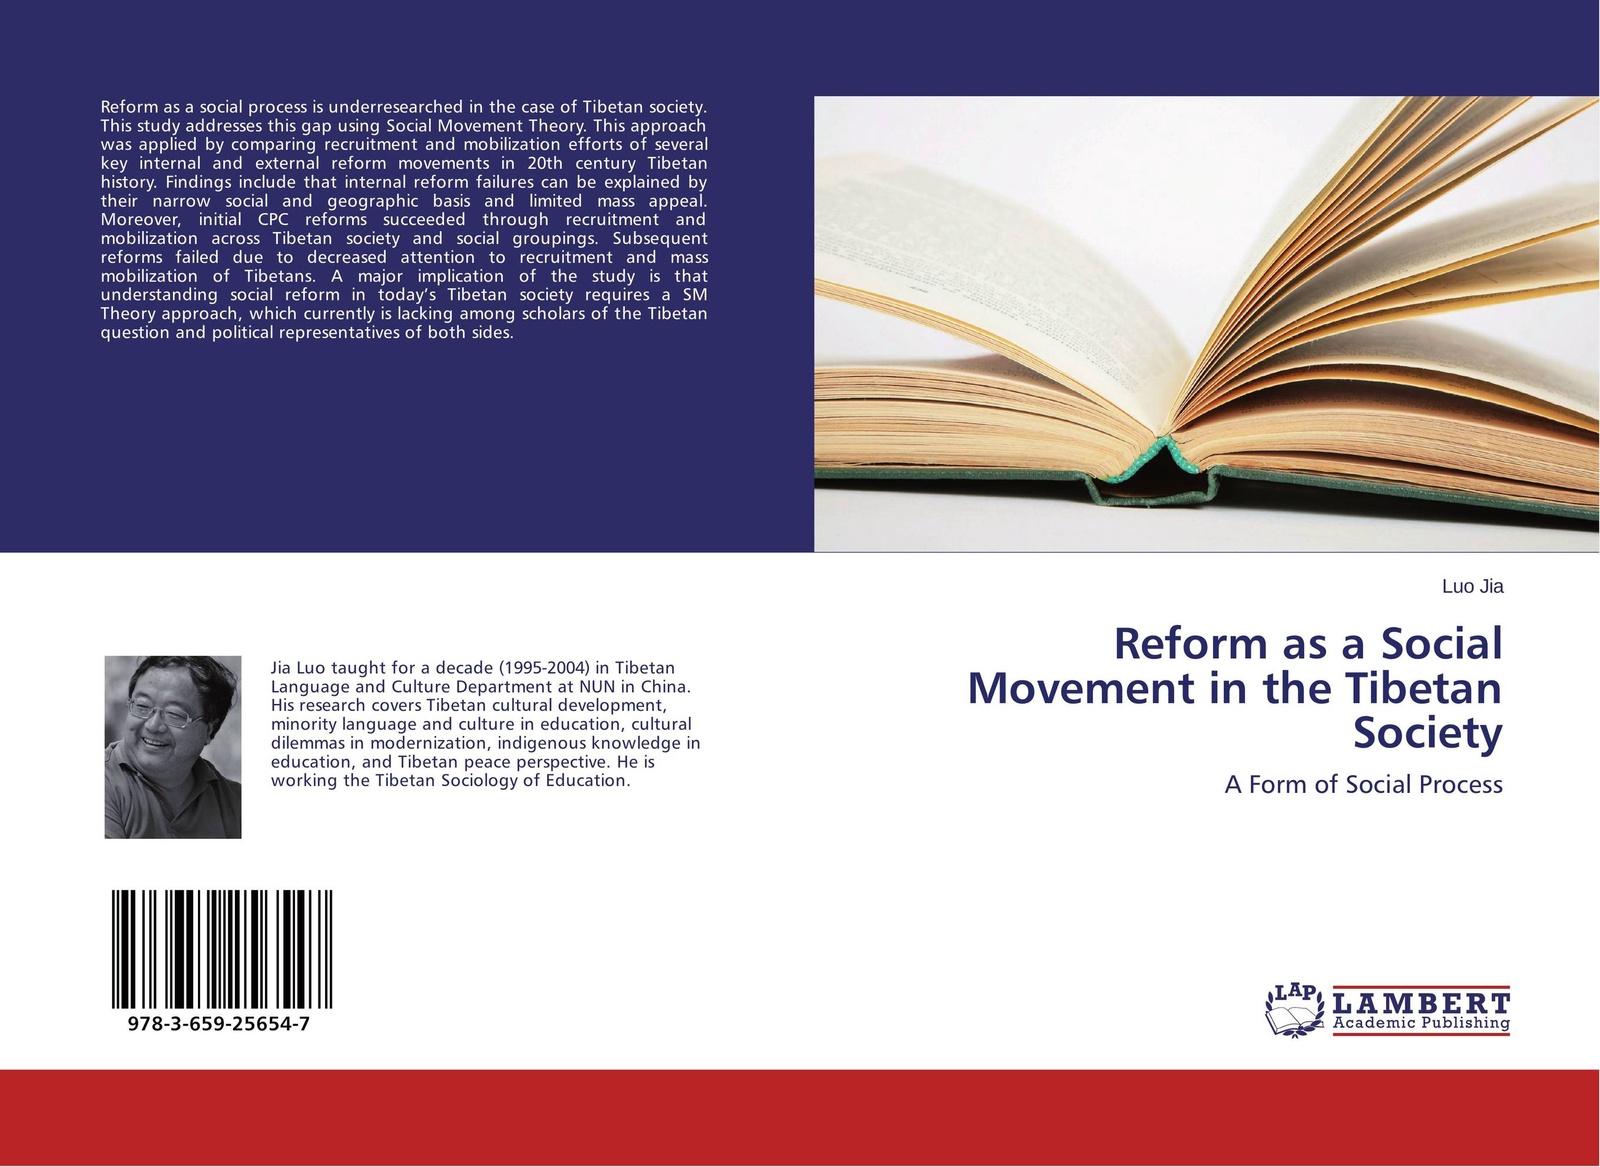 купить Luo Jia Reform as a Social Movement in the Tibetan Society по цене 4419 рублей